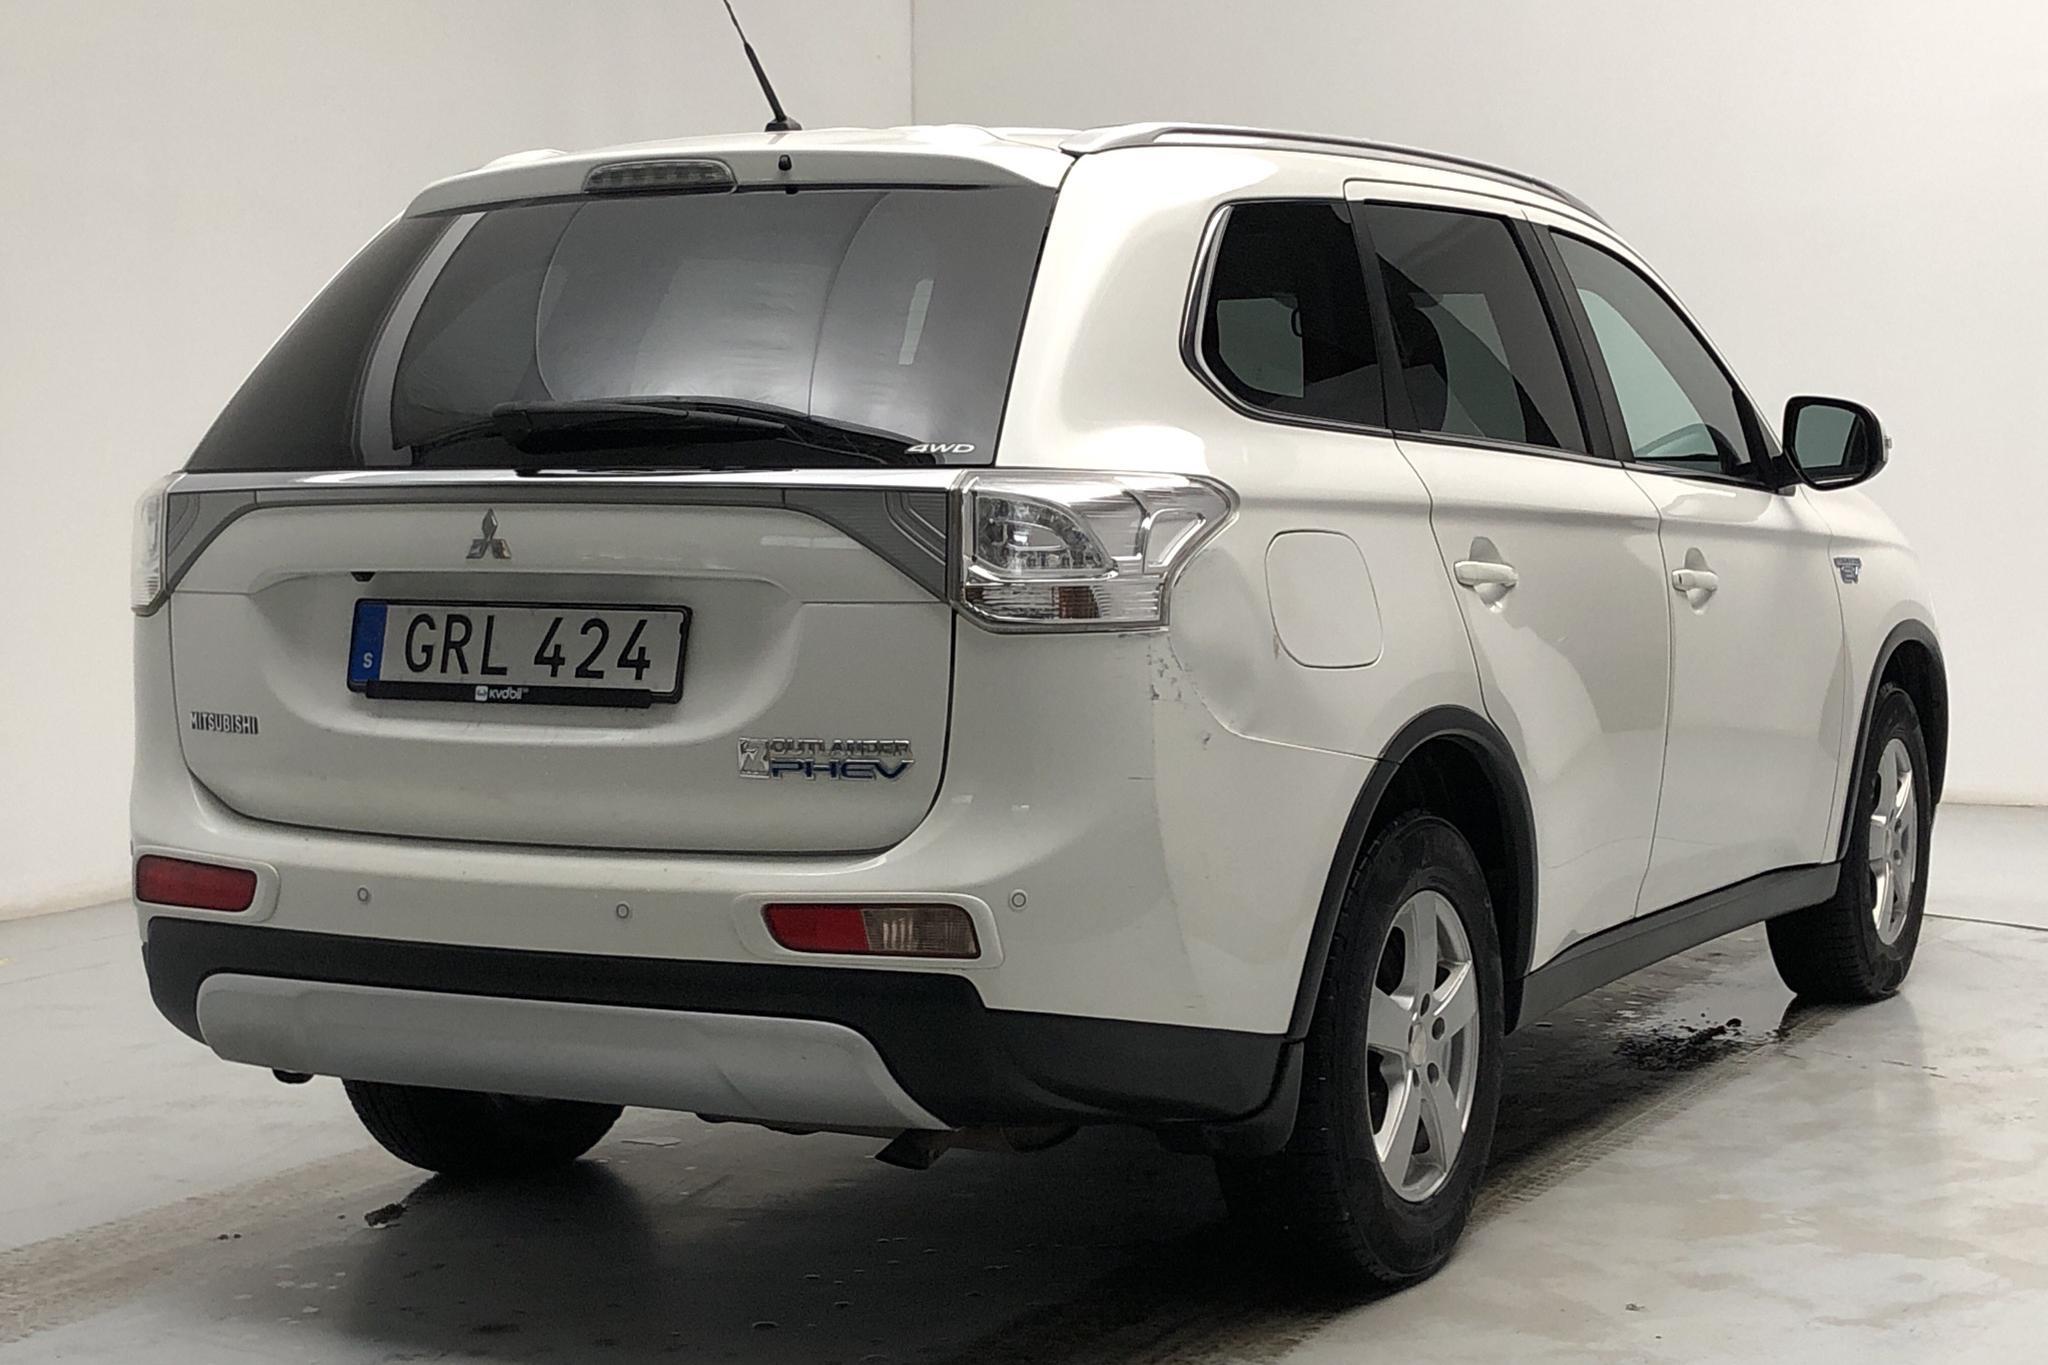 Mitsubishi Outlander 2.0 Plug-in Hybrid 4WD (121hk) - 142 420 km - Automatic - white - 2015